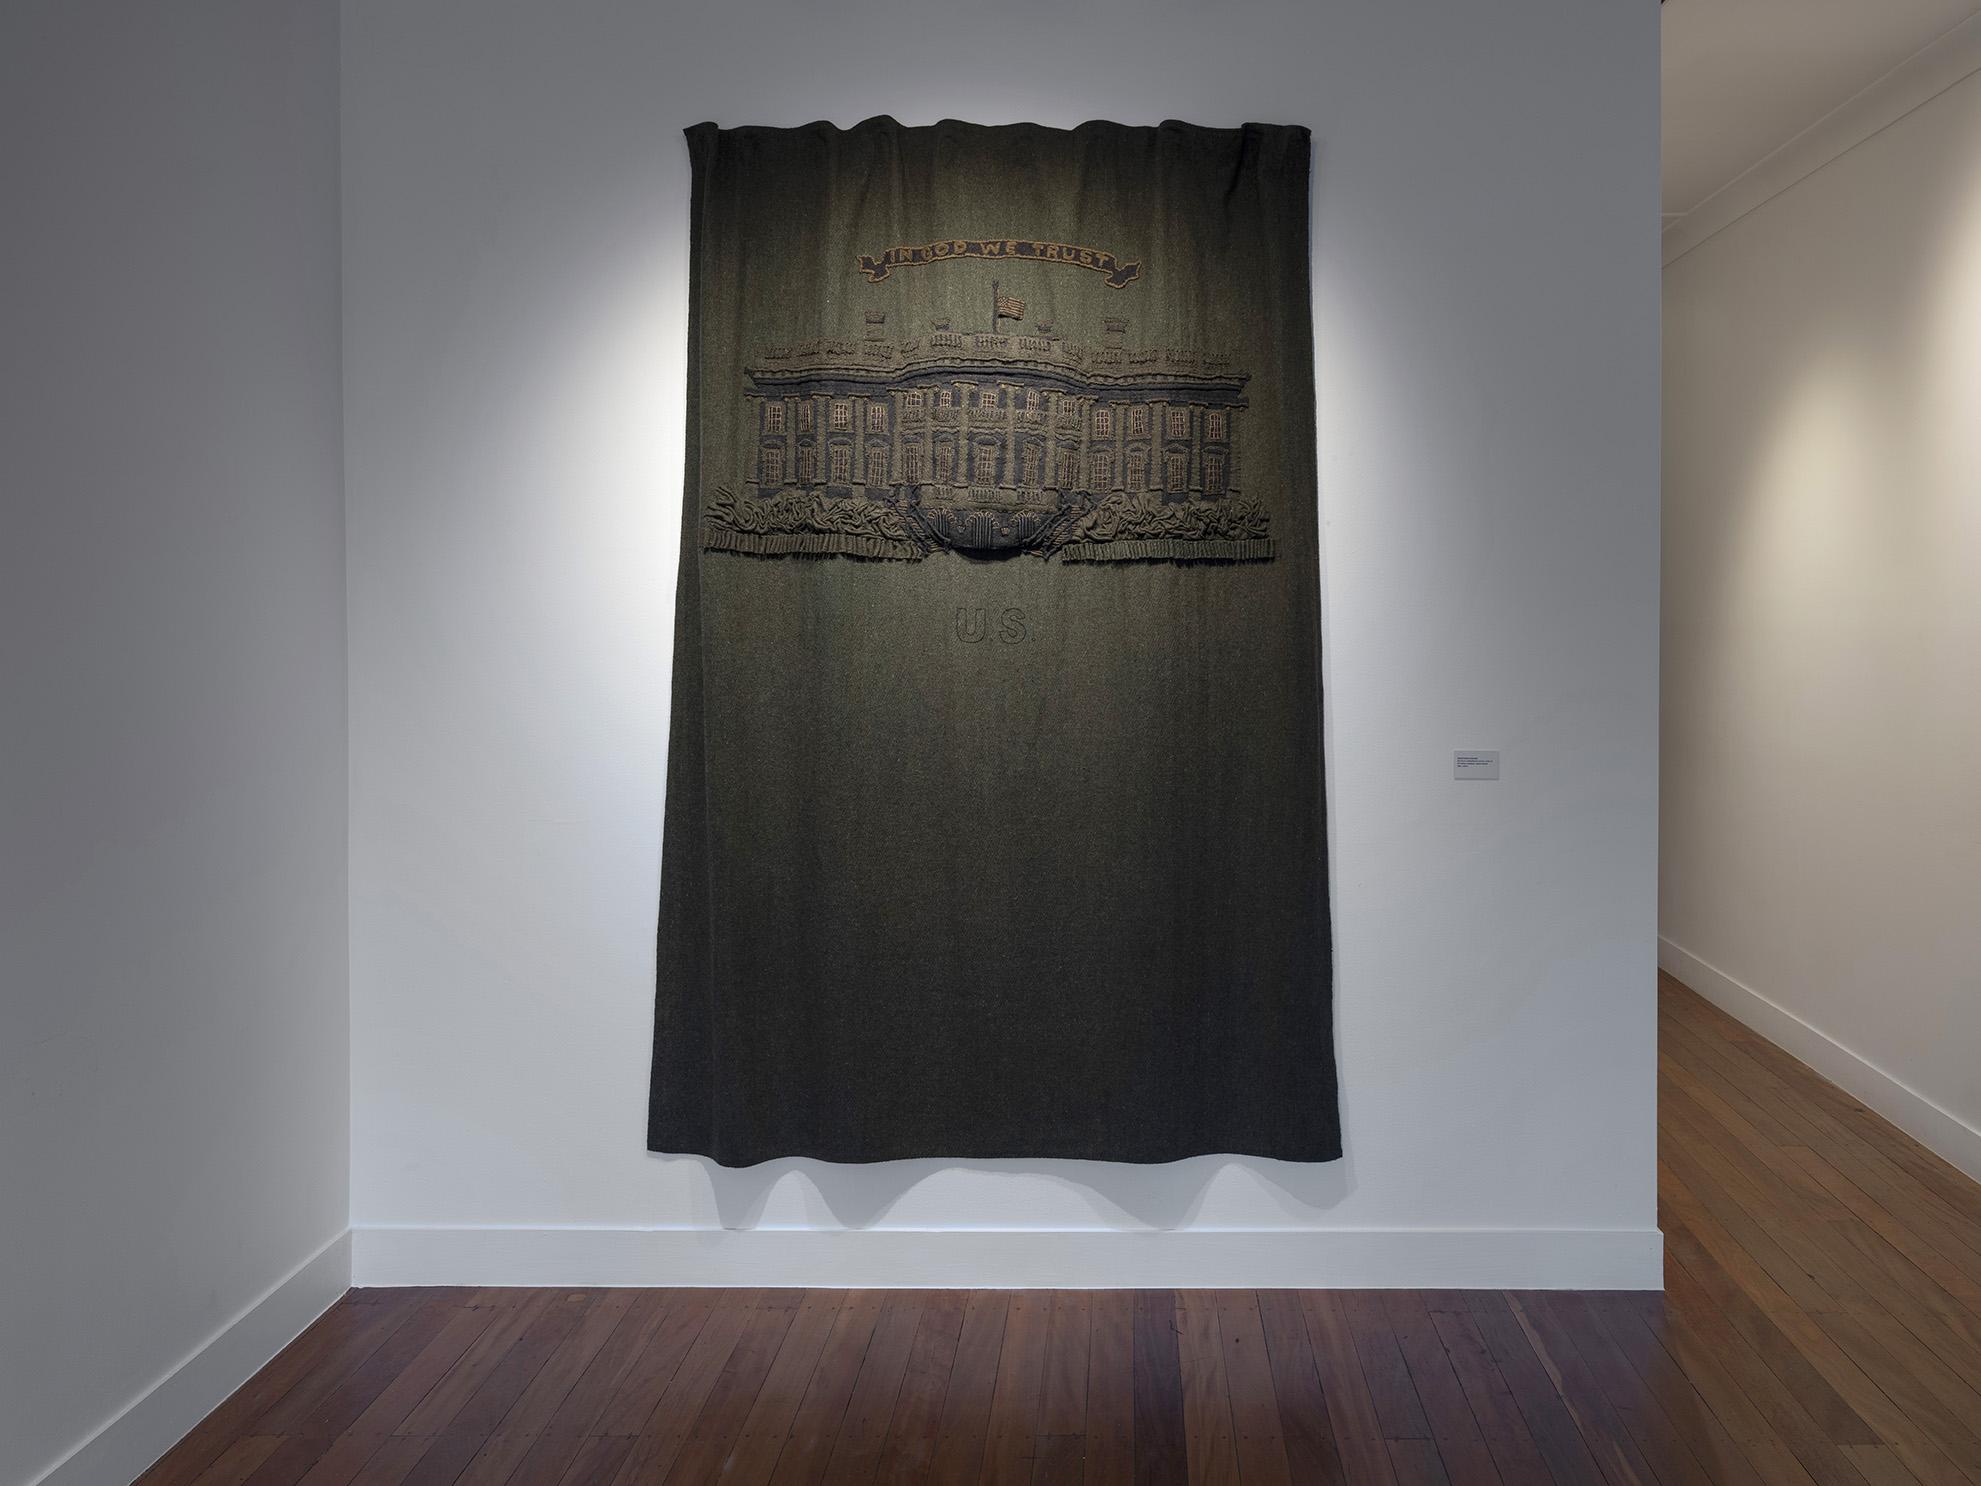 Sebastian Di Mauro, $20 (from GREENBACK series), 2018-19<br/>US military blankets, cotton thread, 163 x 210 cm